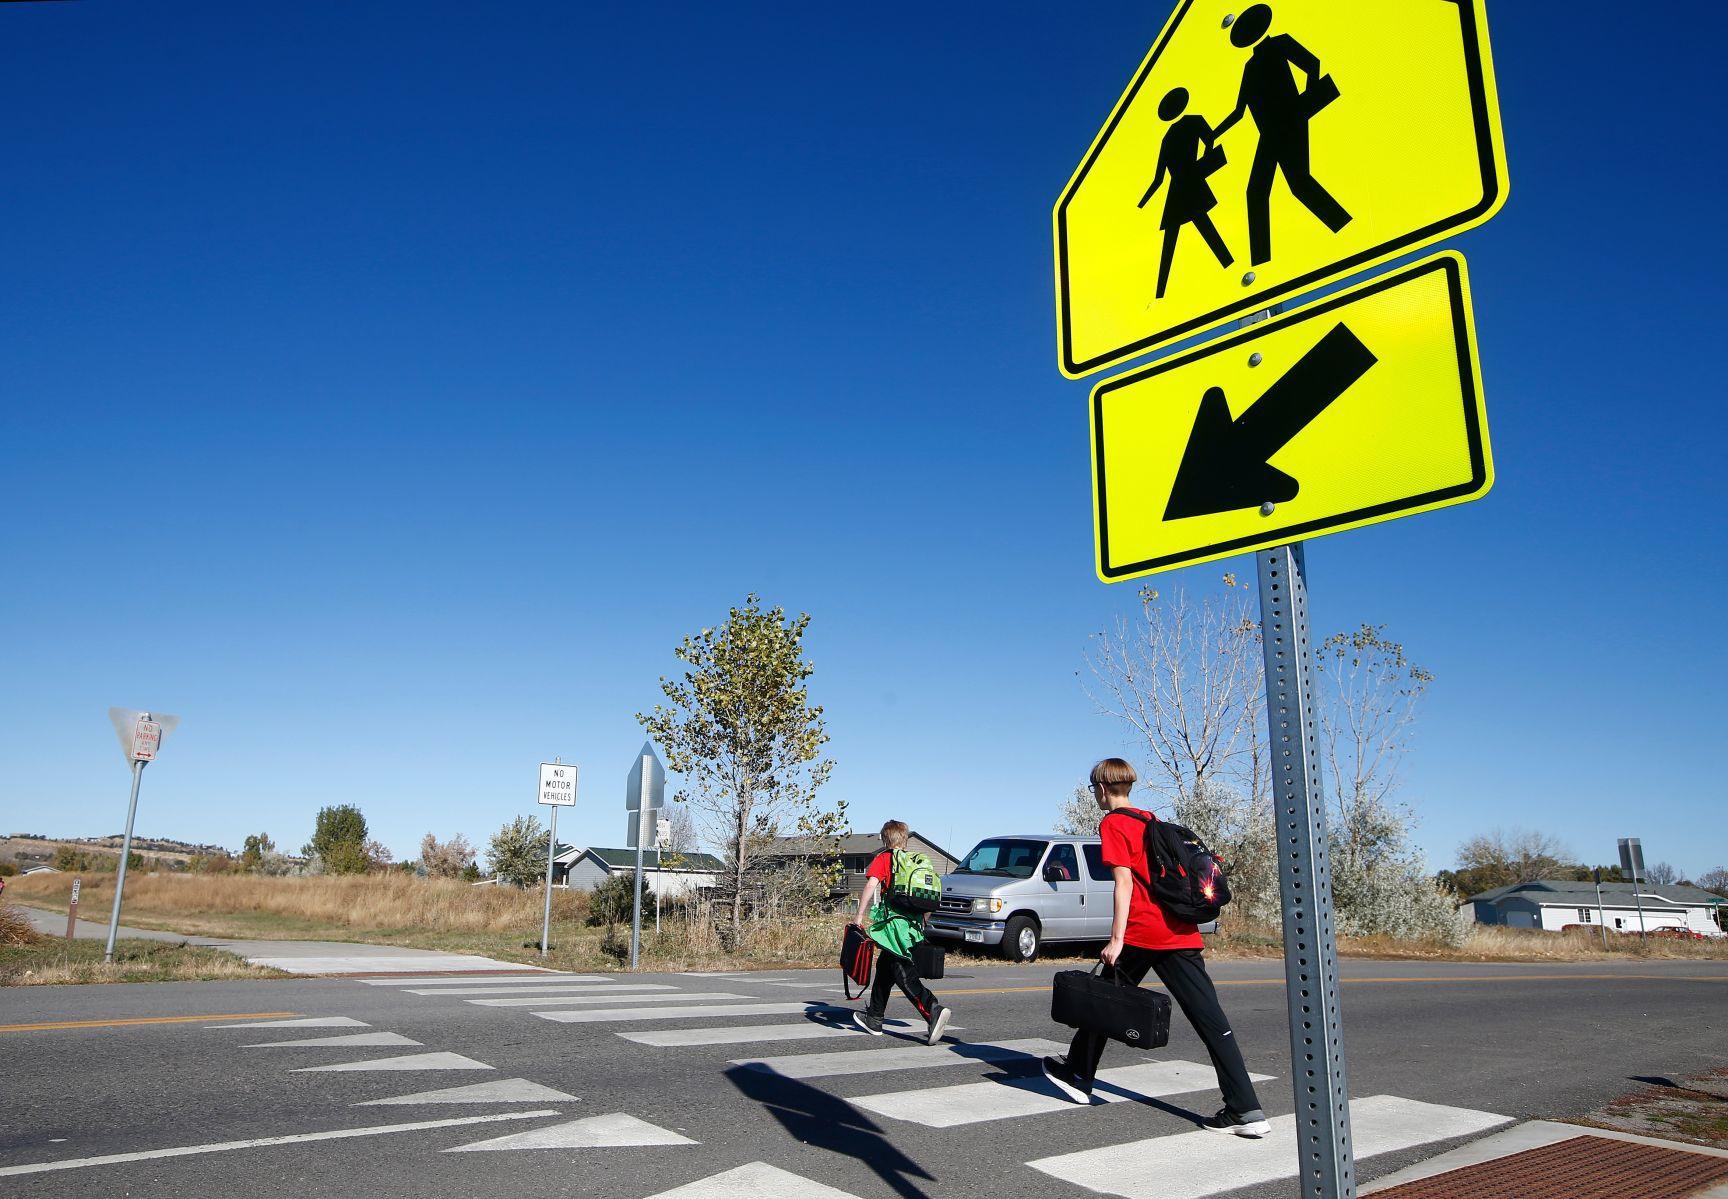 Billings groups look at how to make kids' walks to school safer | Billings Gazette